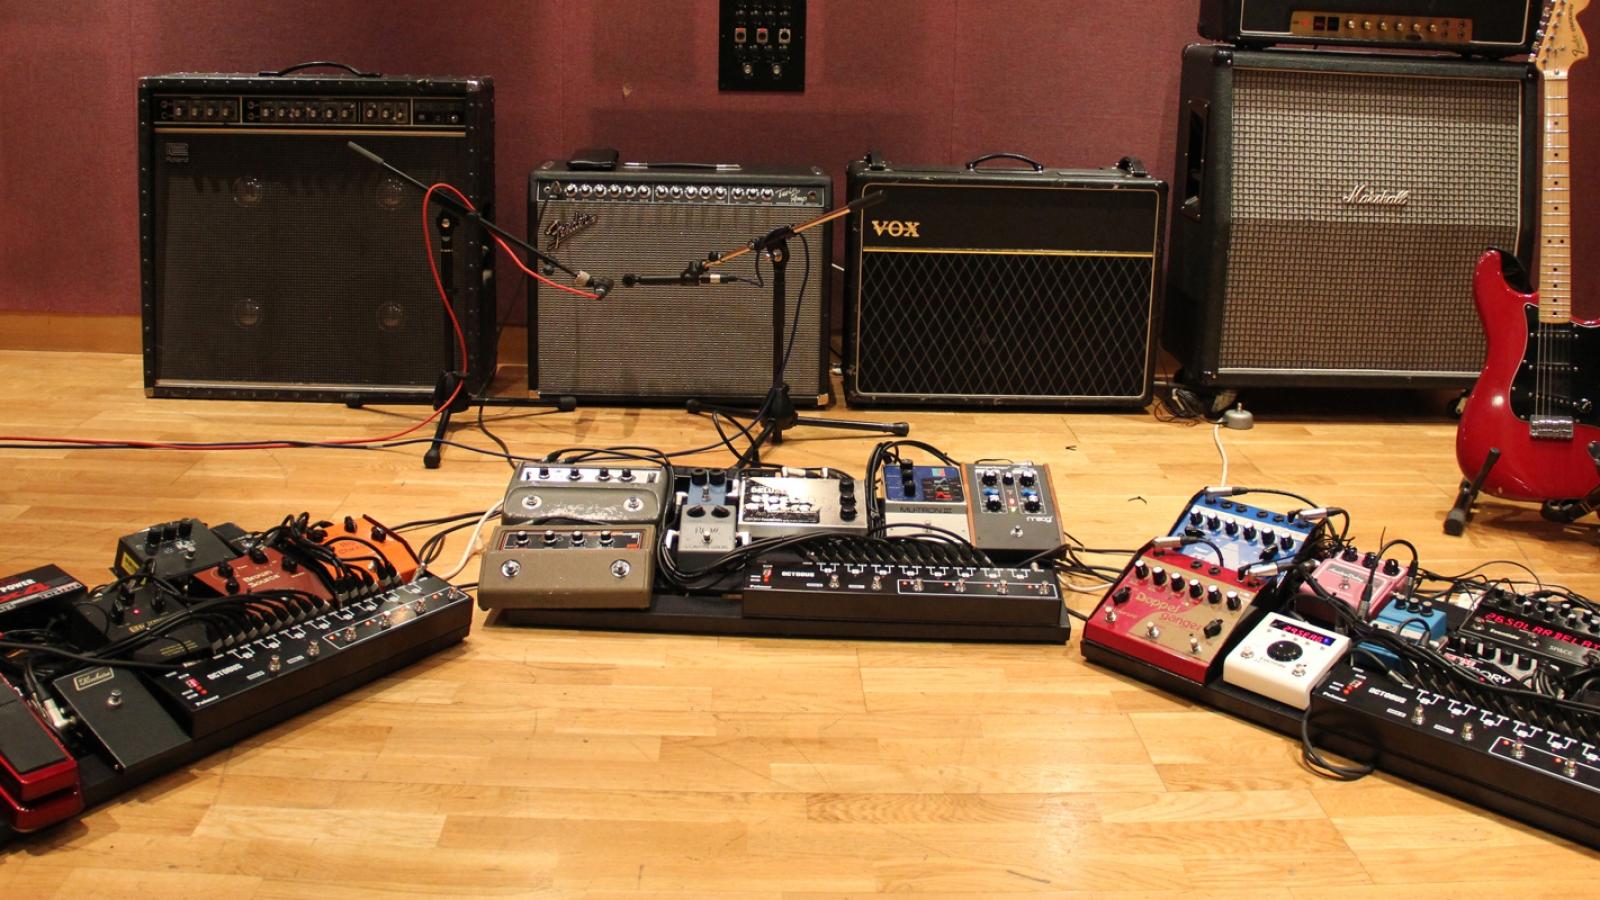 livingston studio 2 guitar pedals london recording studio. Black Bedroom Furniture Sets. Home Design Ideas